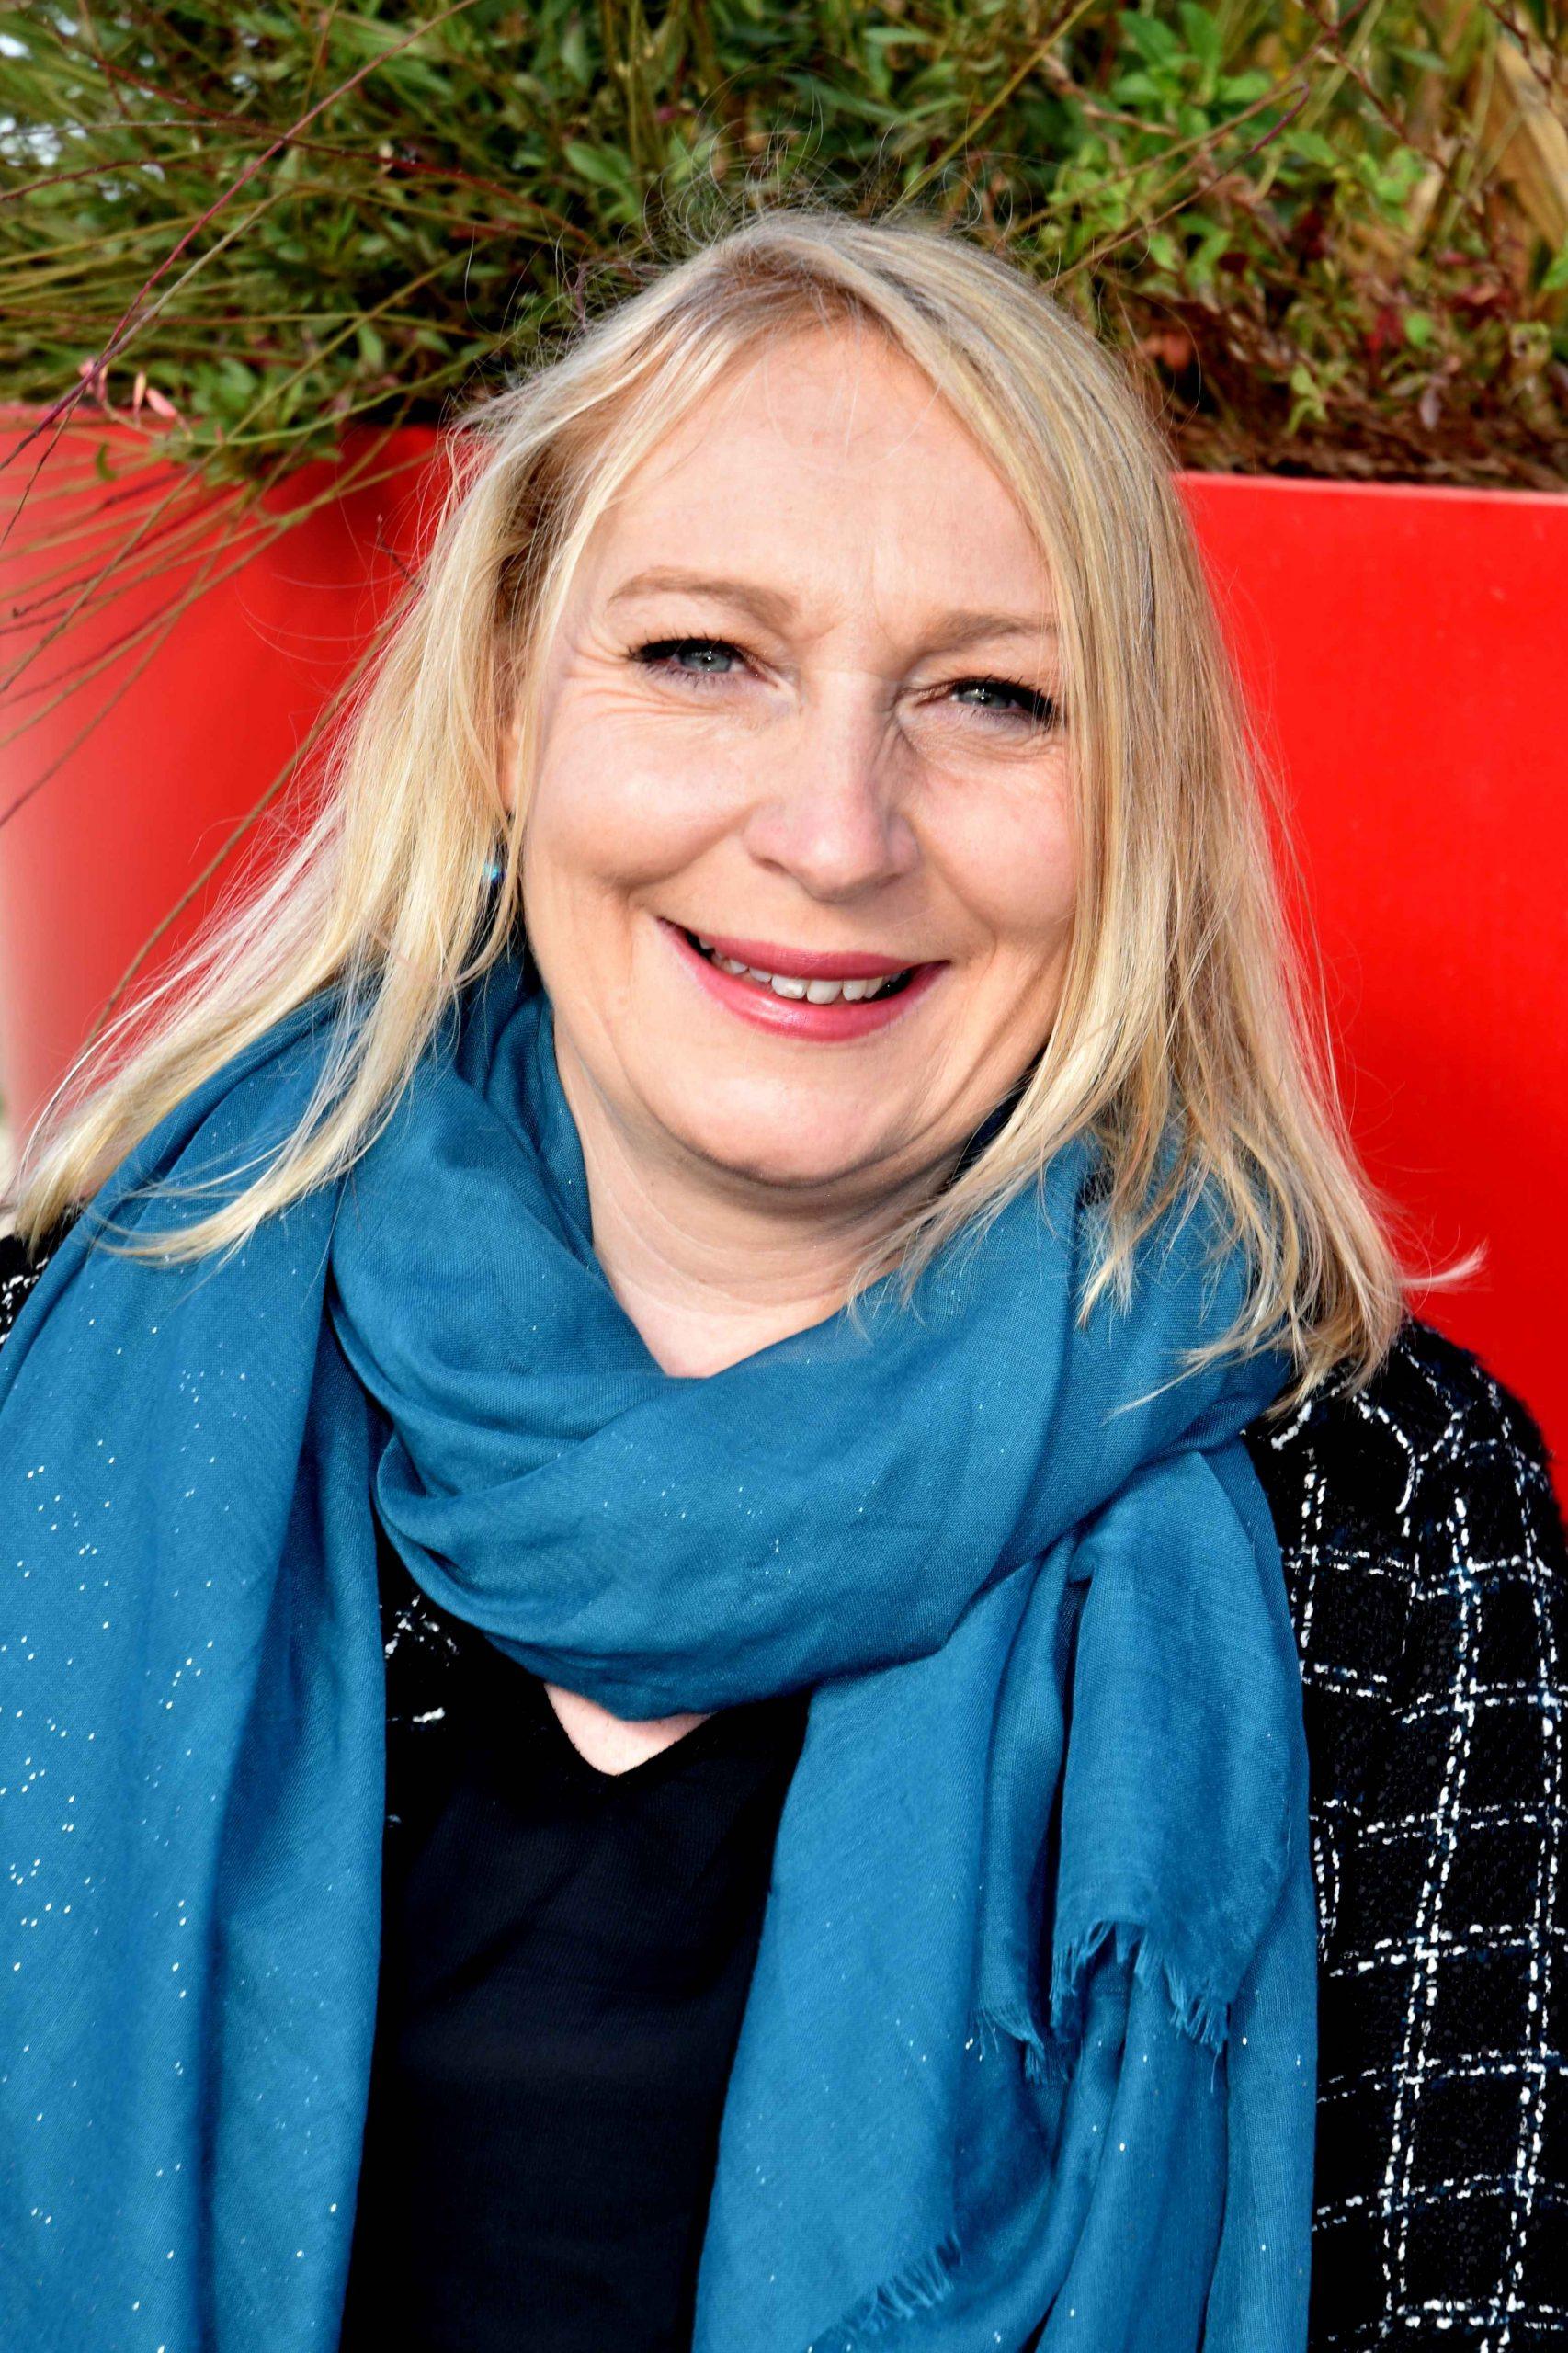 Marie-Laure Giorsetti